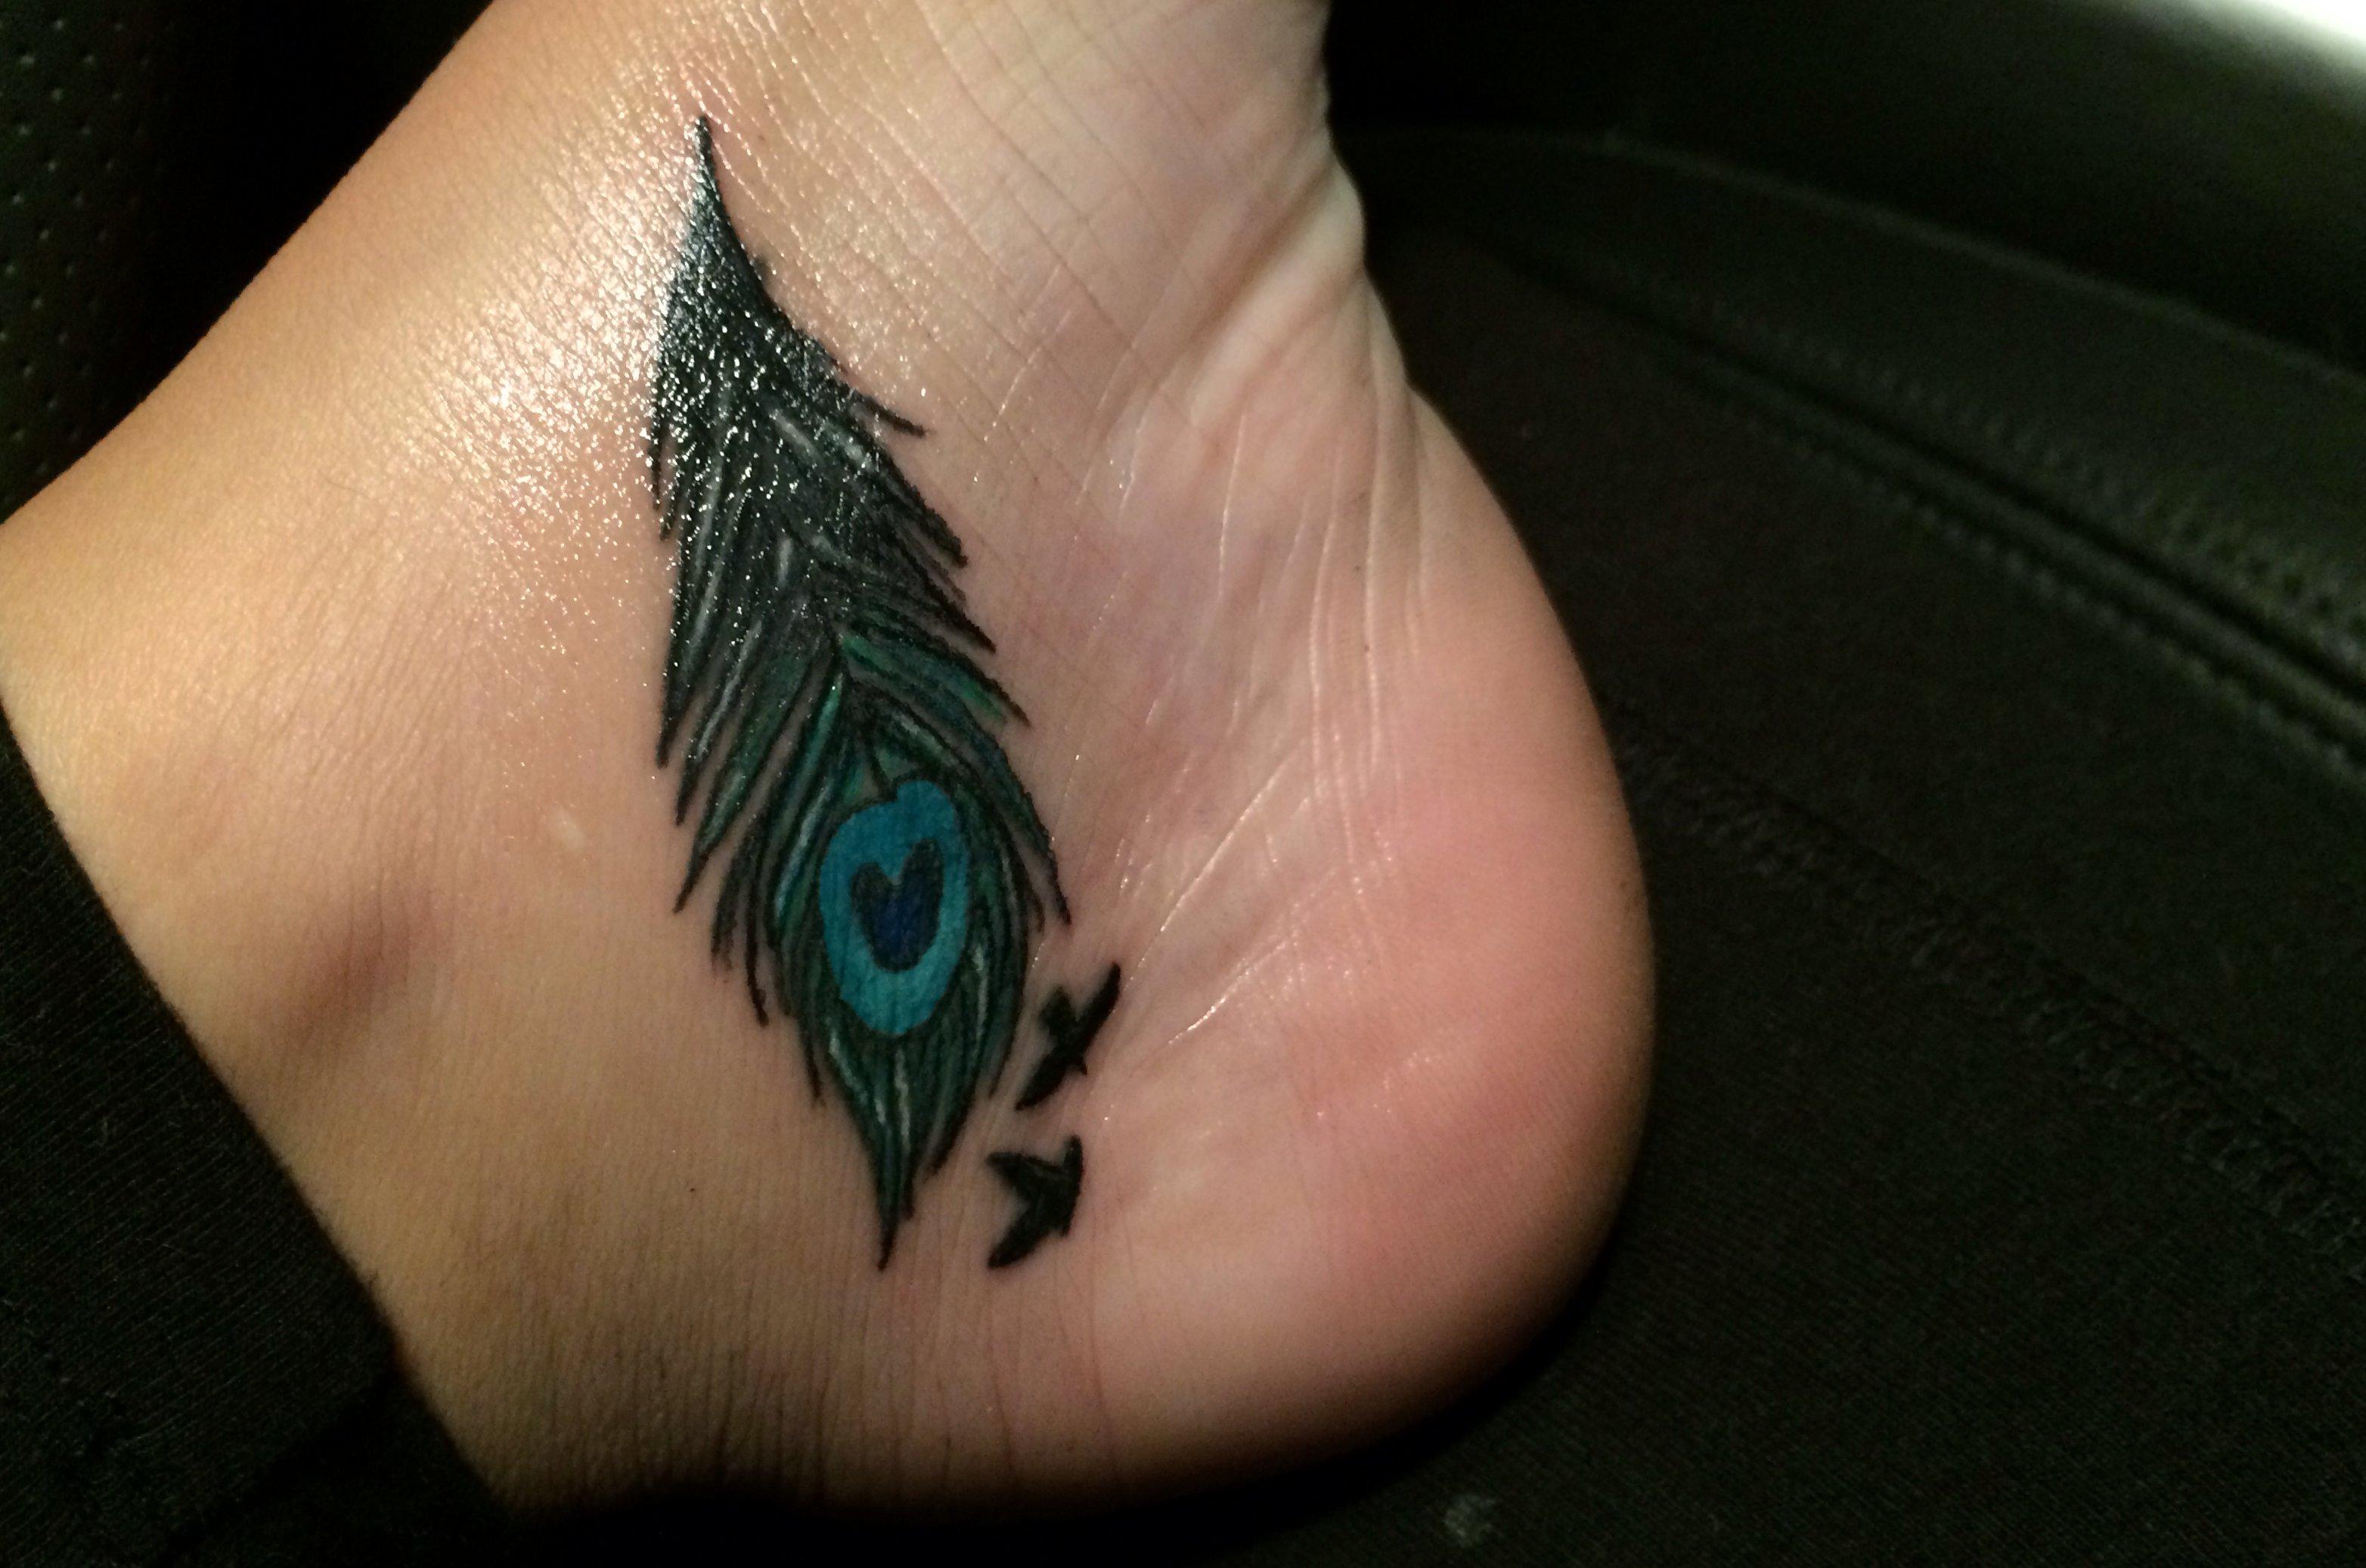 Pfau Tattoo Motive und Pfauenfeder Tattoo Bedeutung alletattoo.de 26